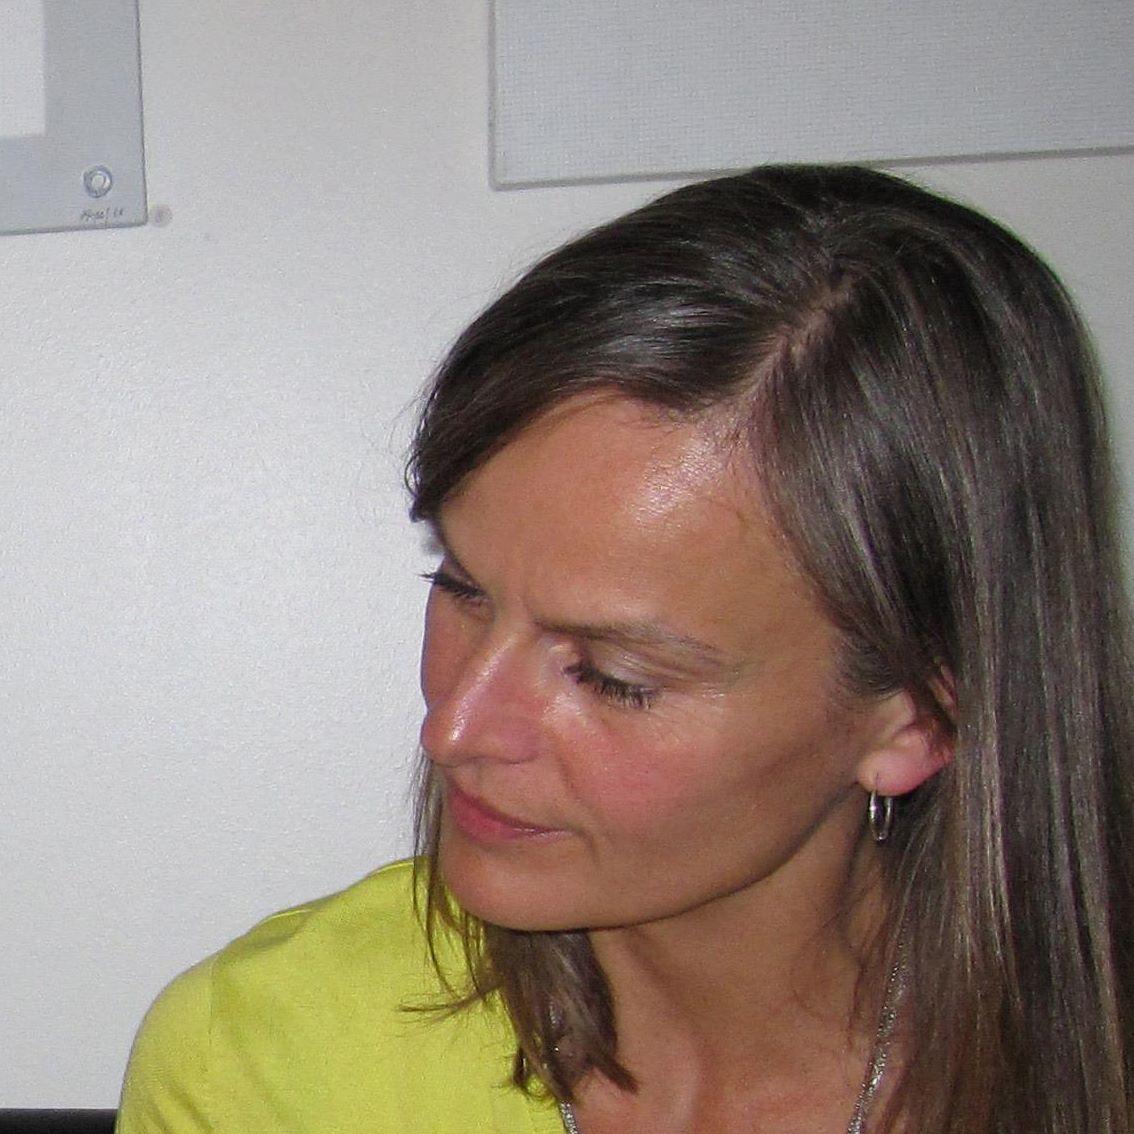 Lise Simmelsgaard